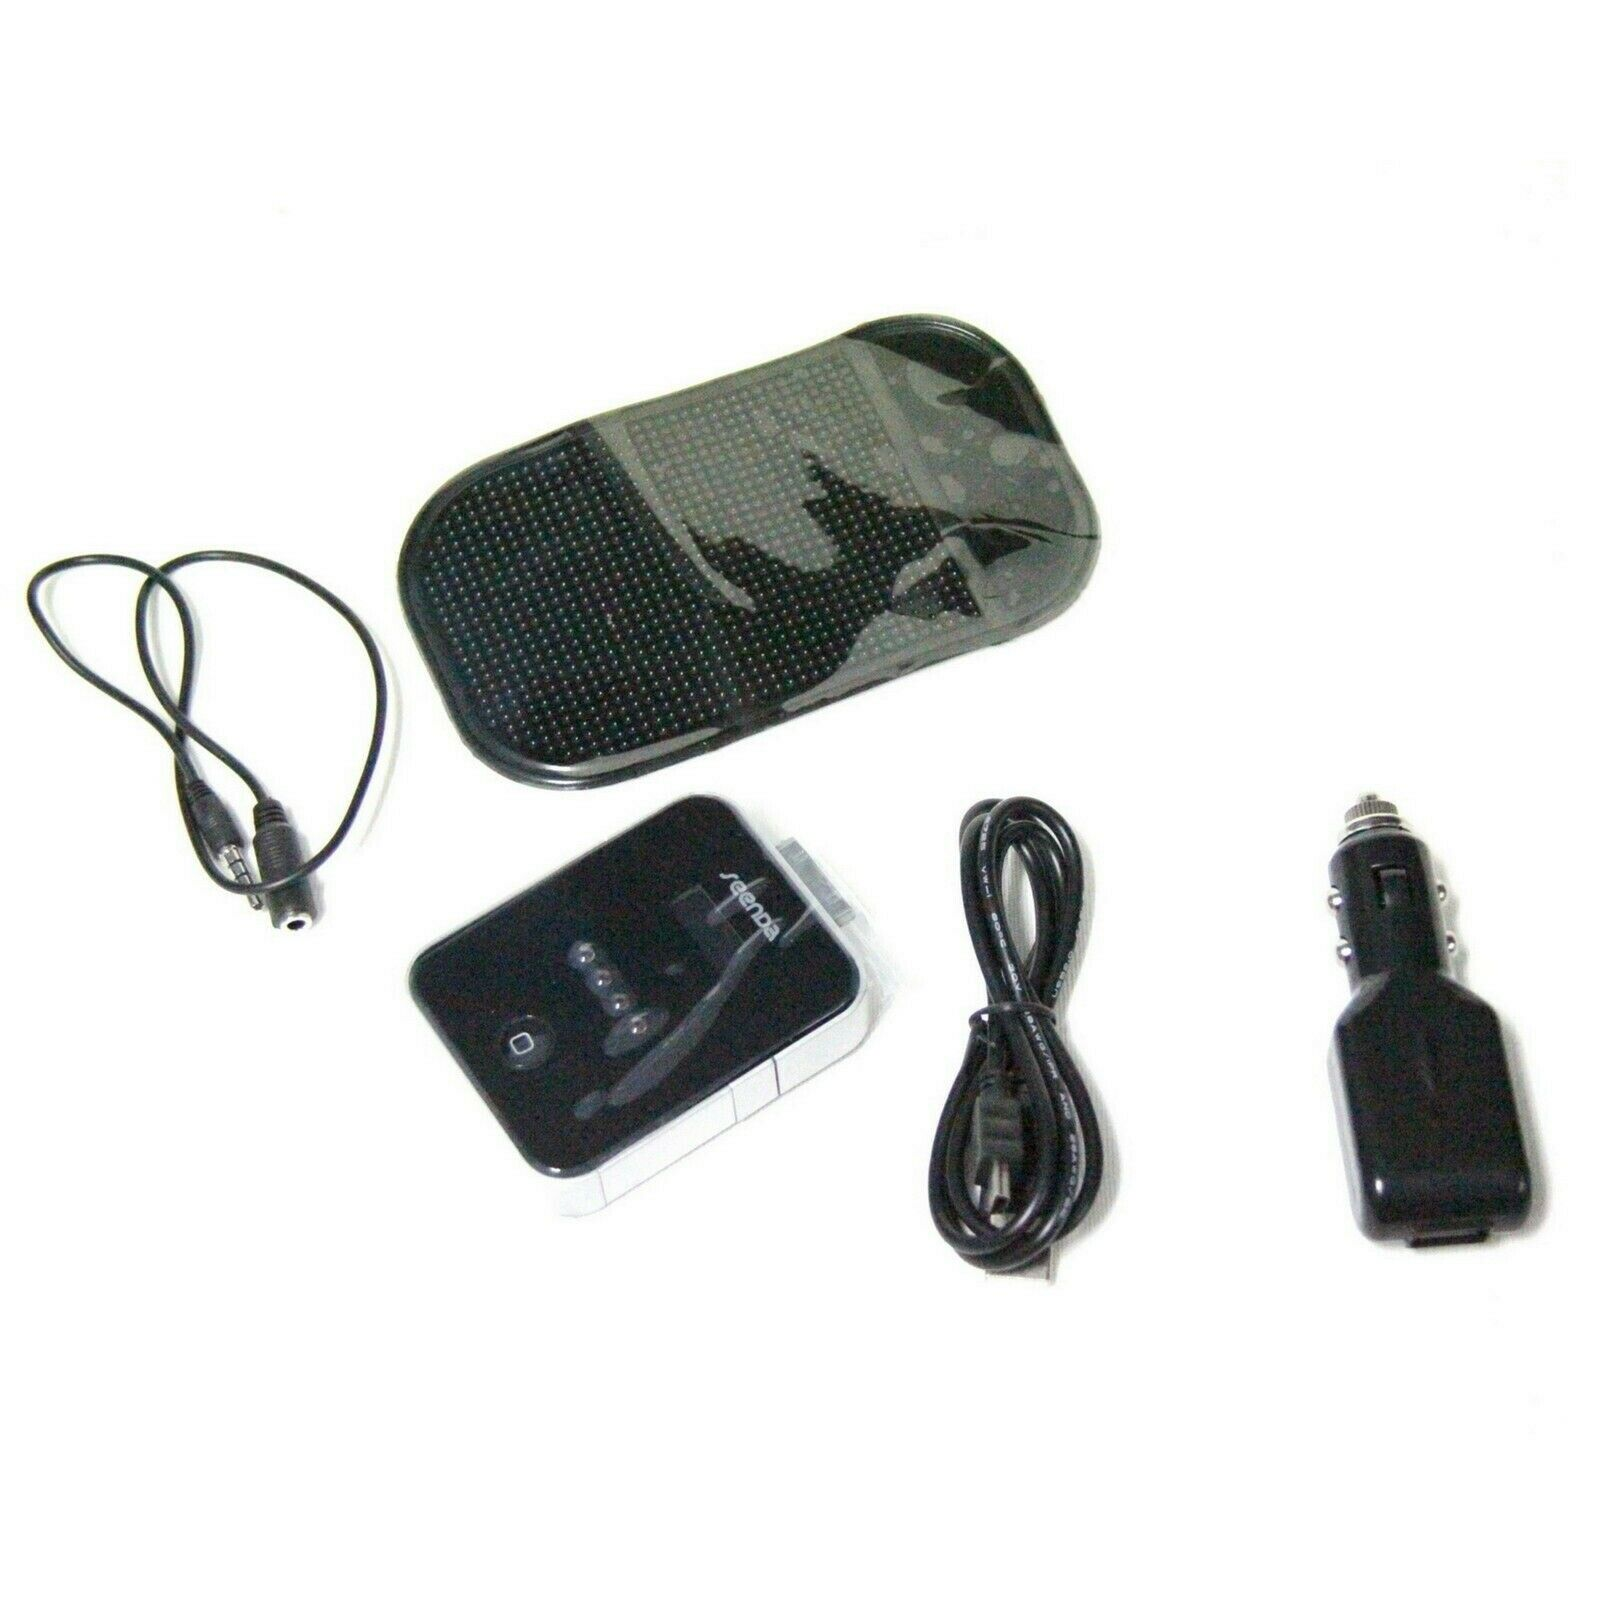 SEENDA FM TRANSMITTER BATTERY CAR CHARGER ANTI SLIP MAT USB